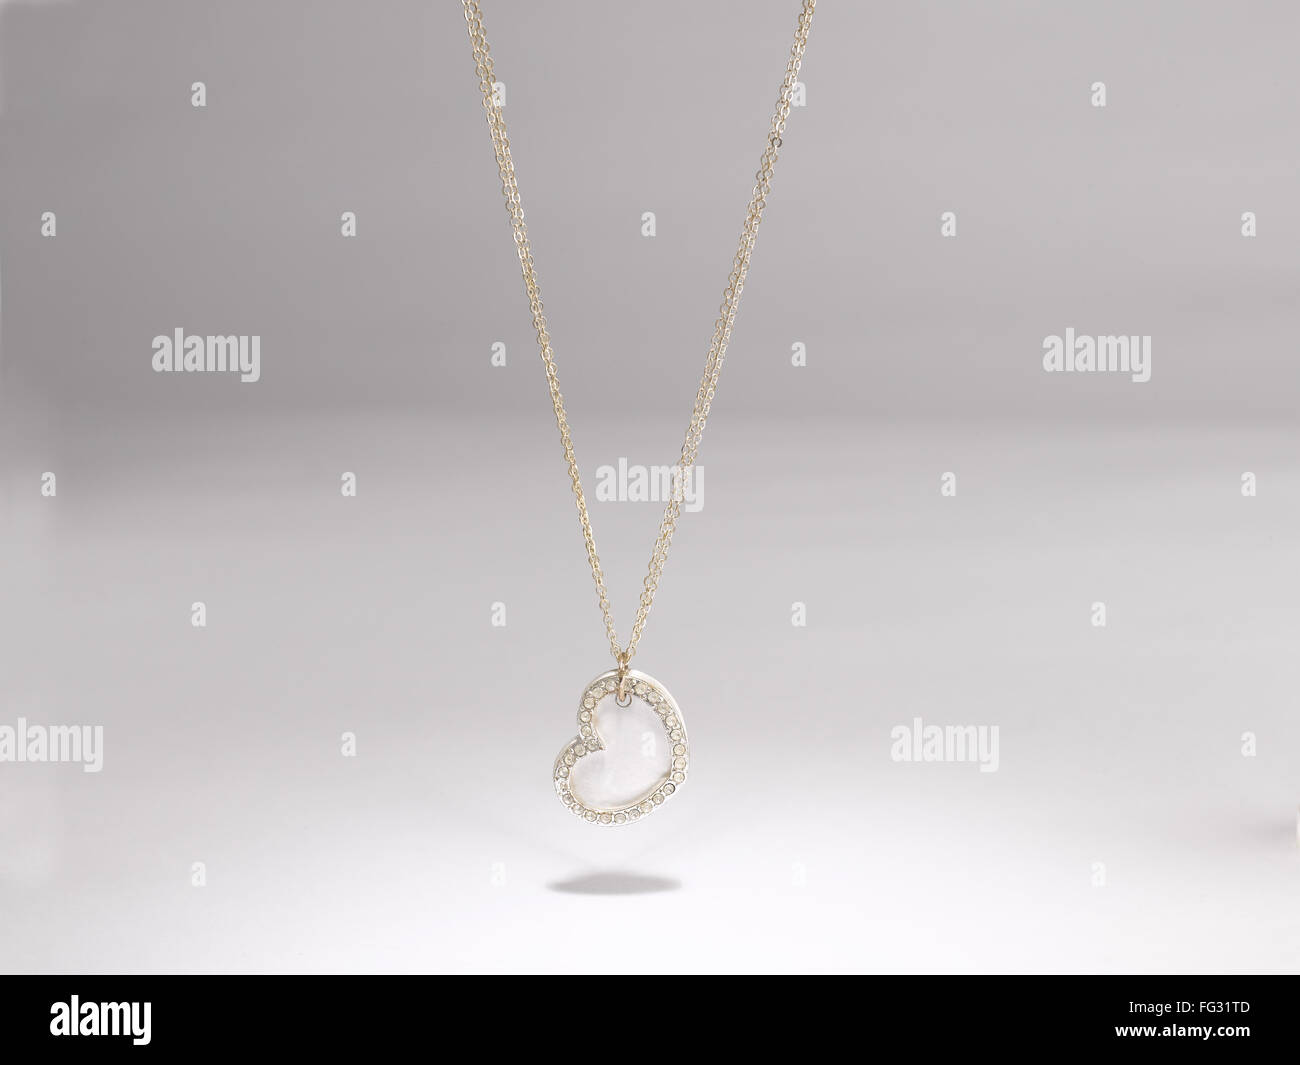 heart shaped pendant imitation silver jewellery - Stock Image